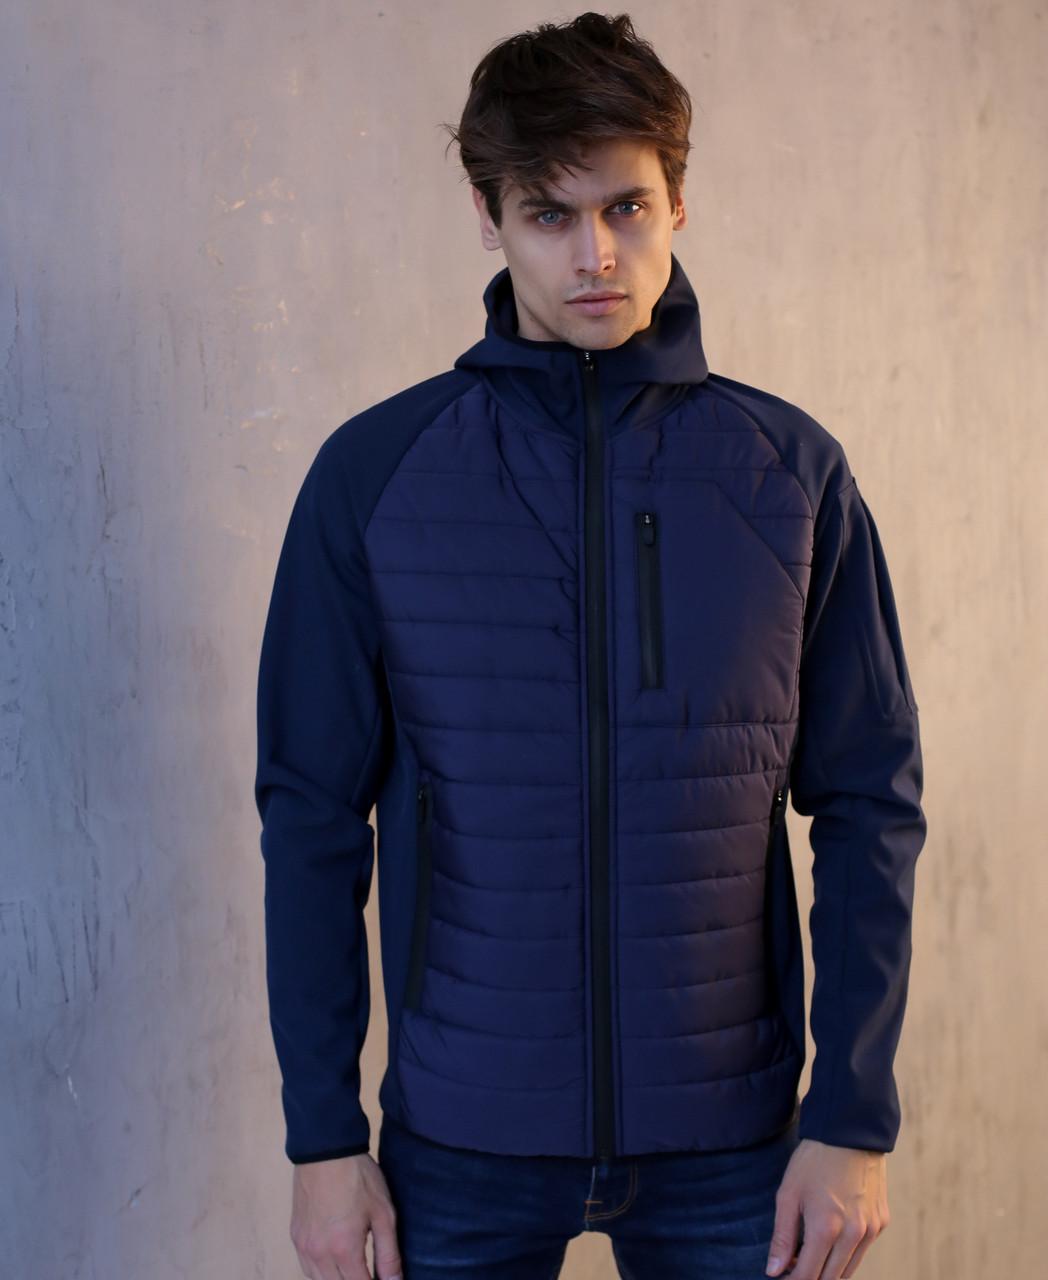 "Мужская демисезонная куртка Pobedov Soft Shell Combi ""Derzhu rayon"" Navy (S, М, L, XL размеры)"